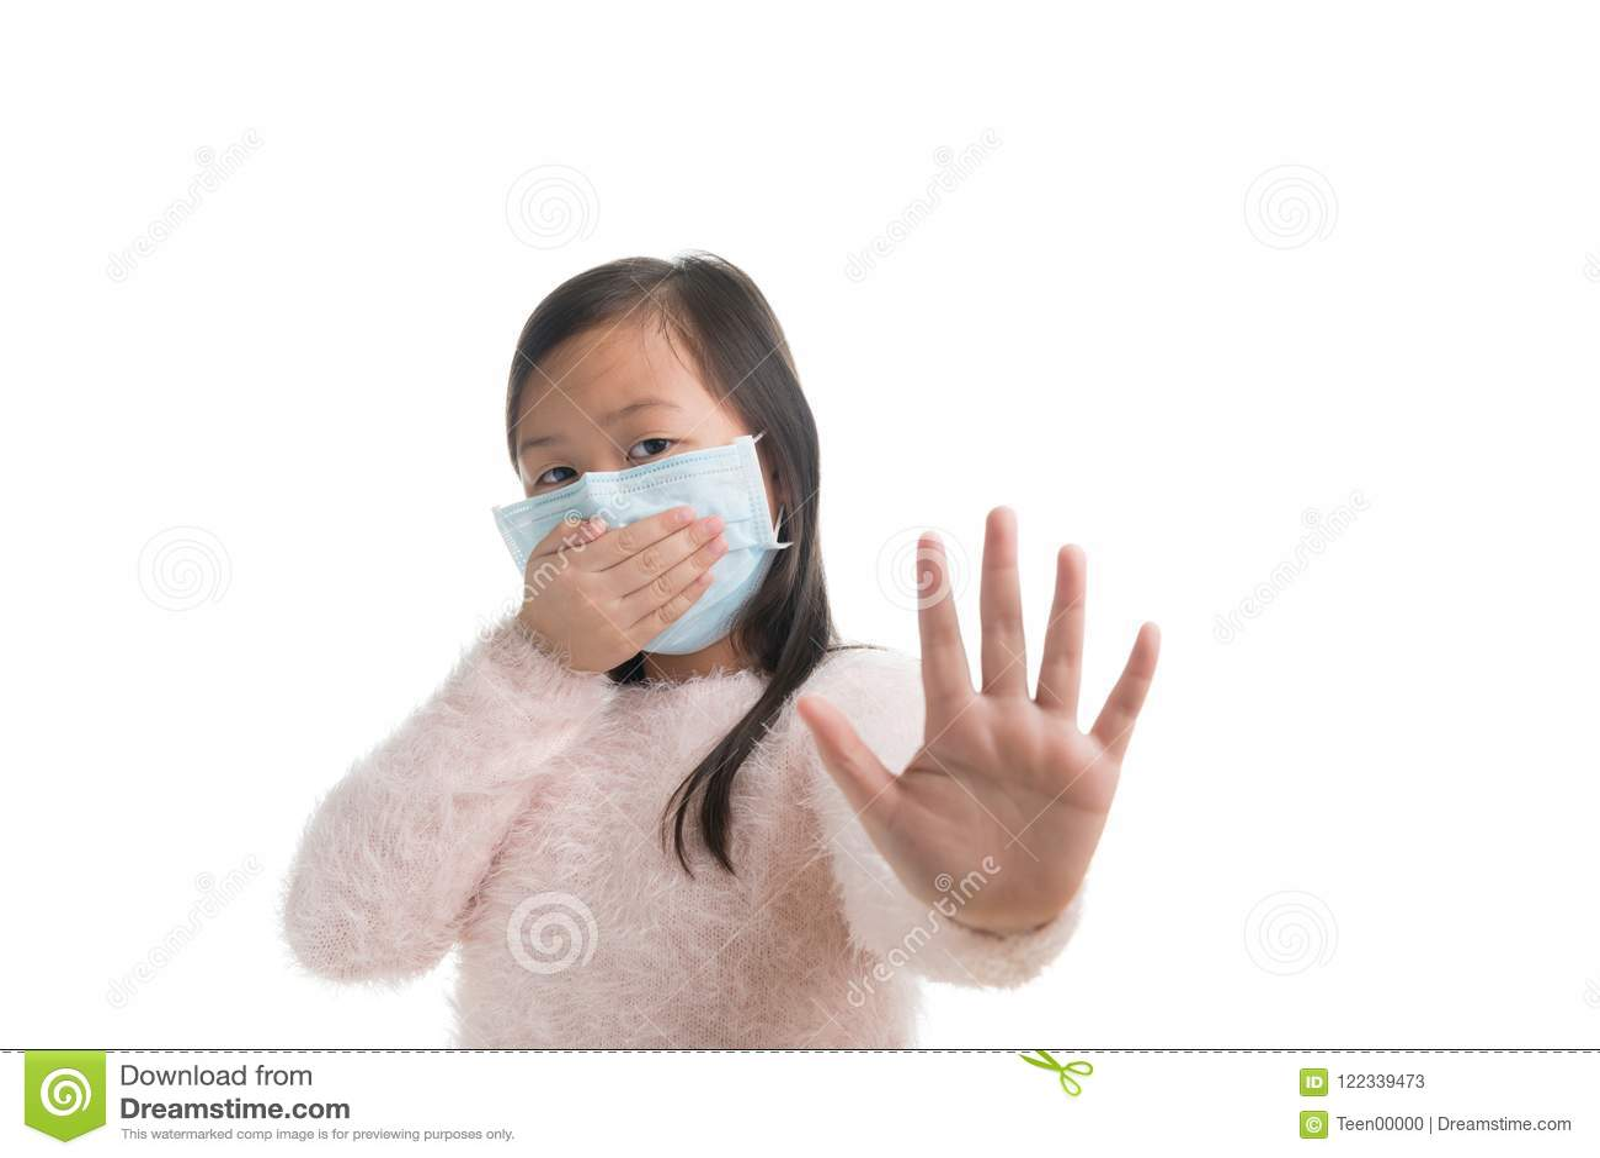 masque protection grippe enfant